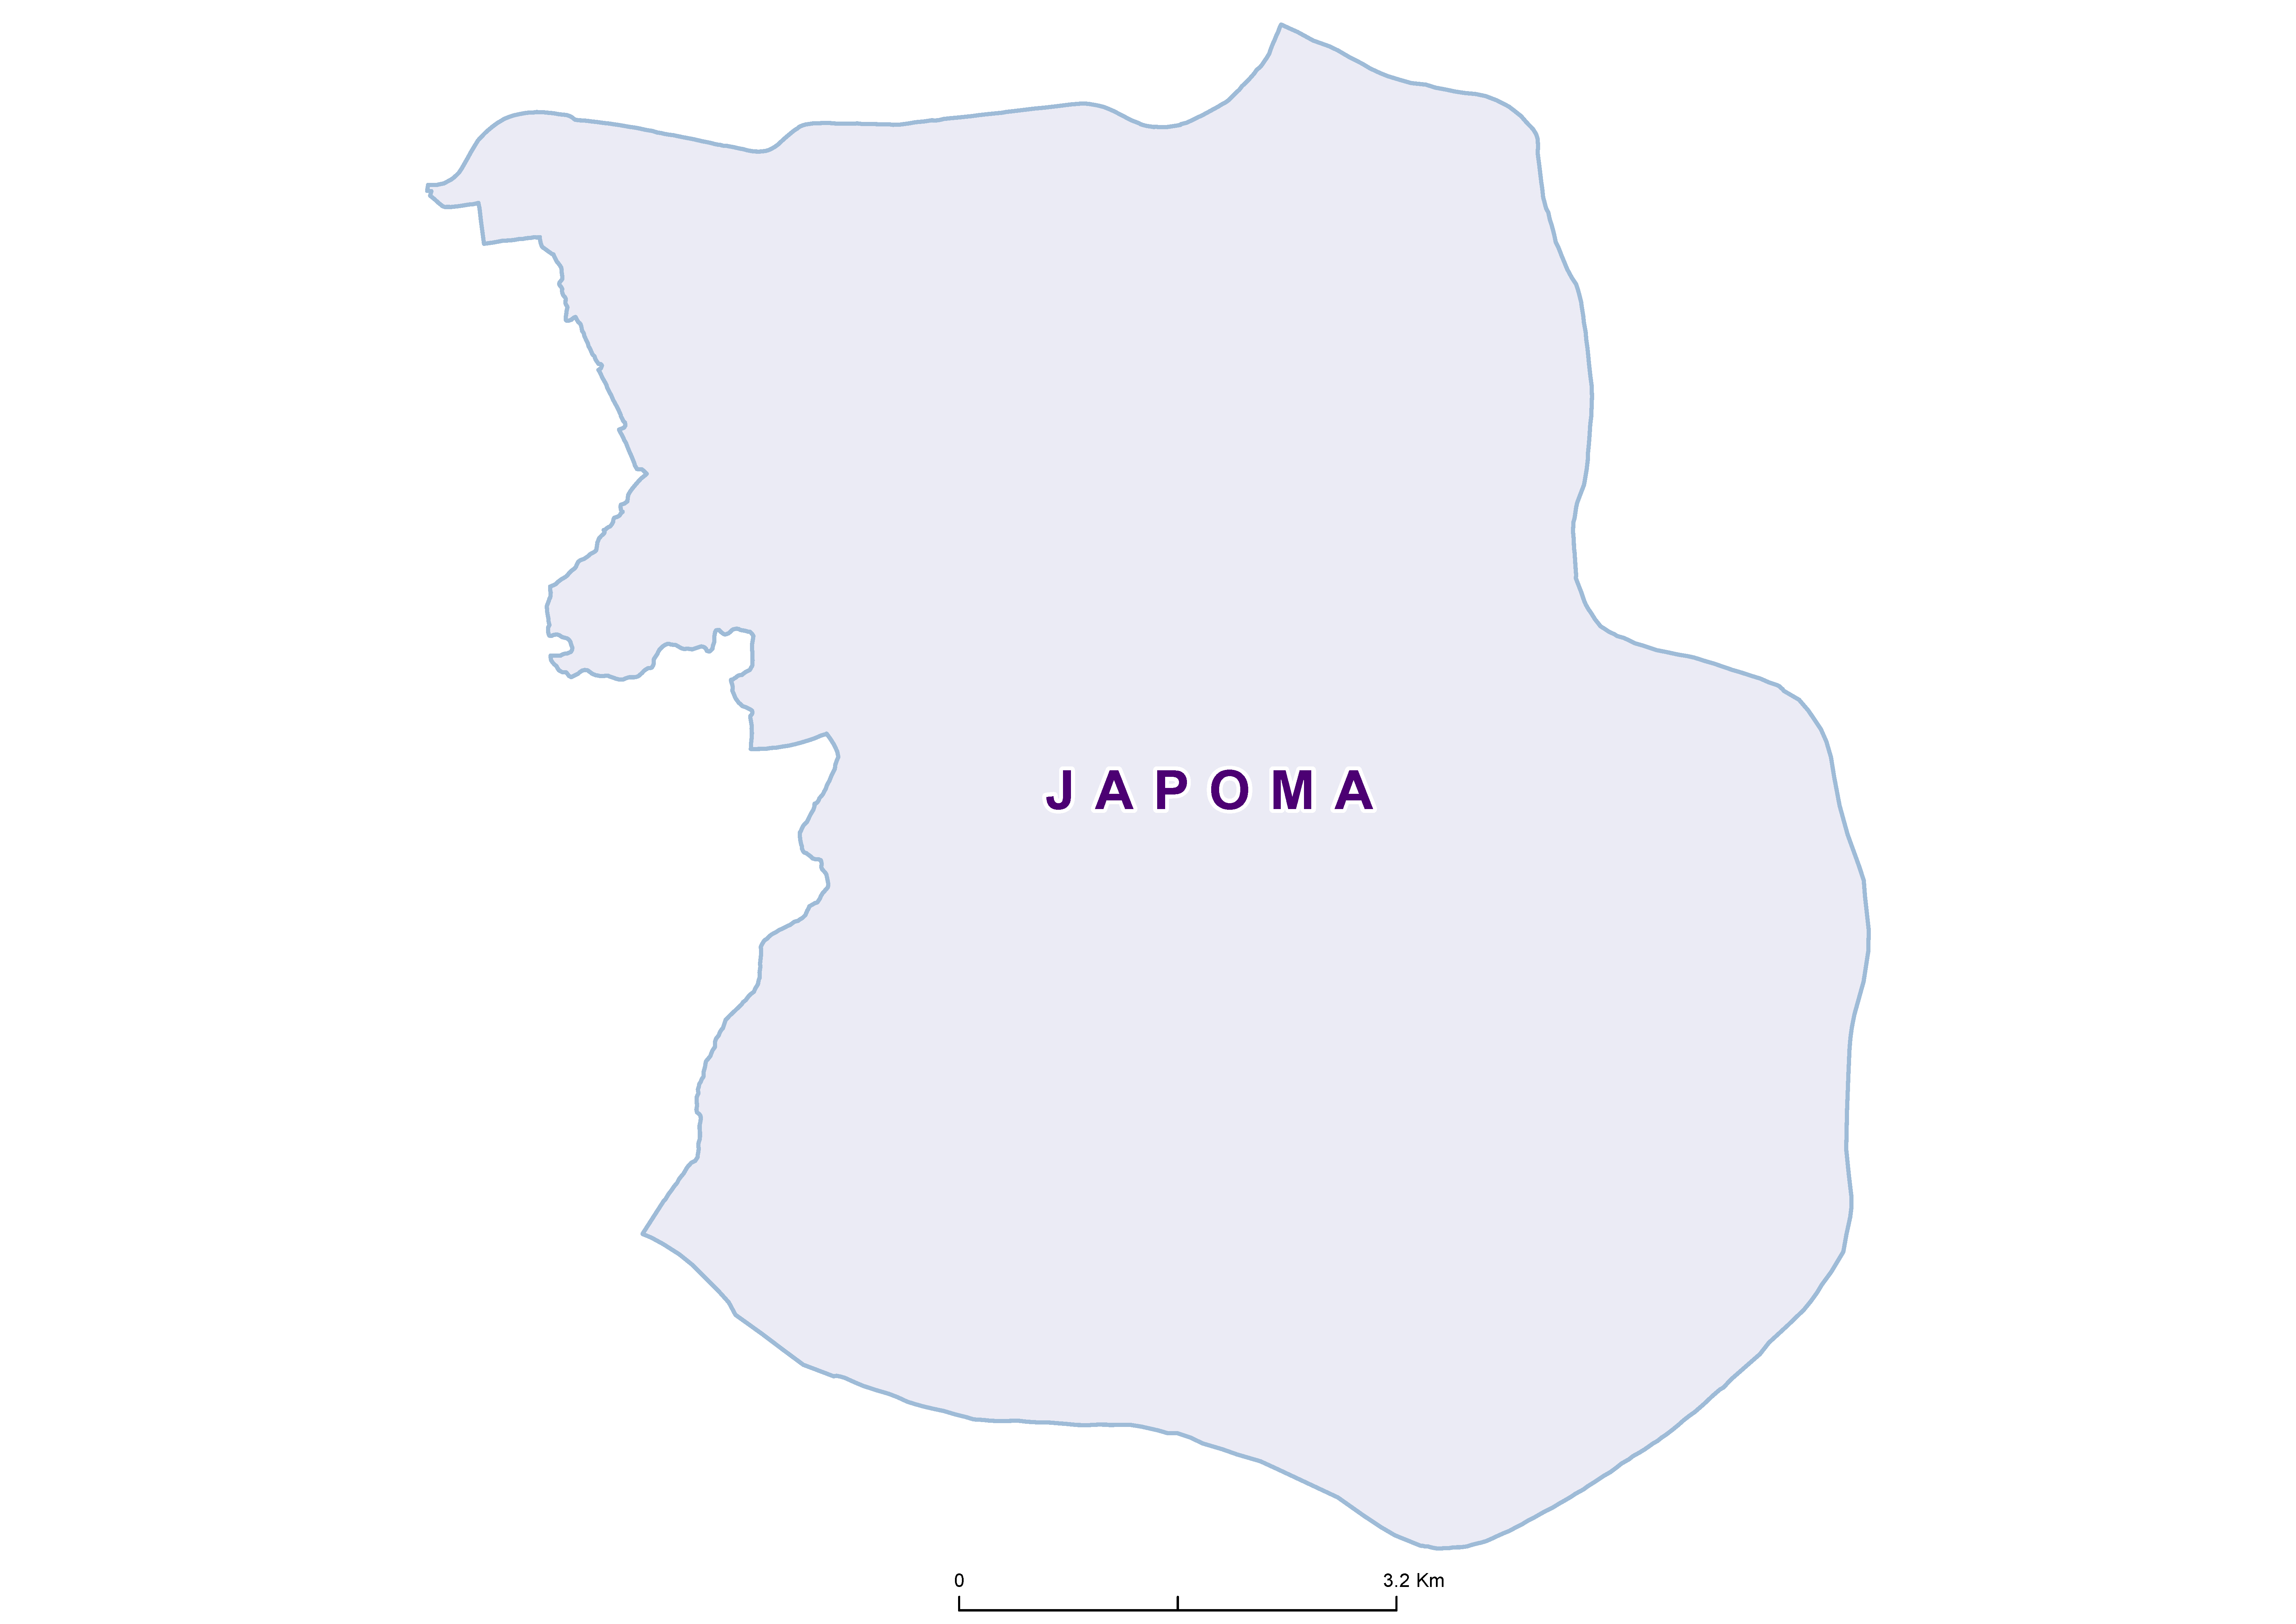 Japoma Max STH 19850001